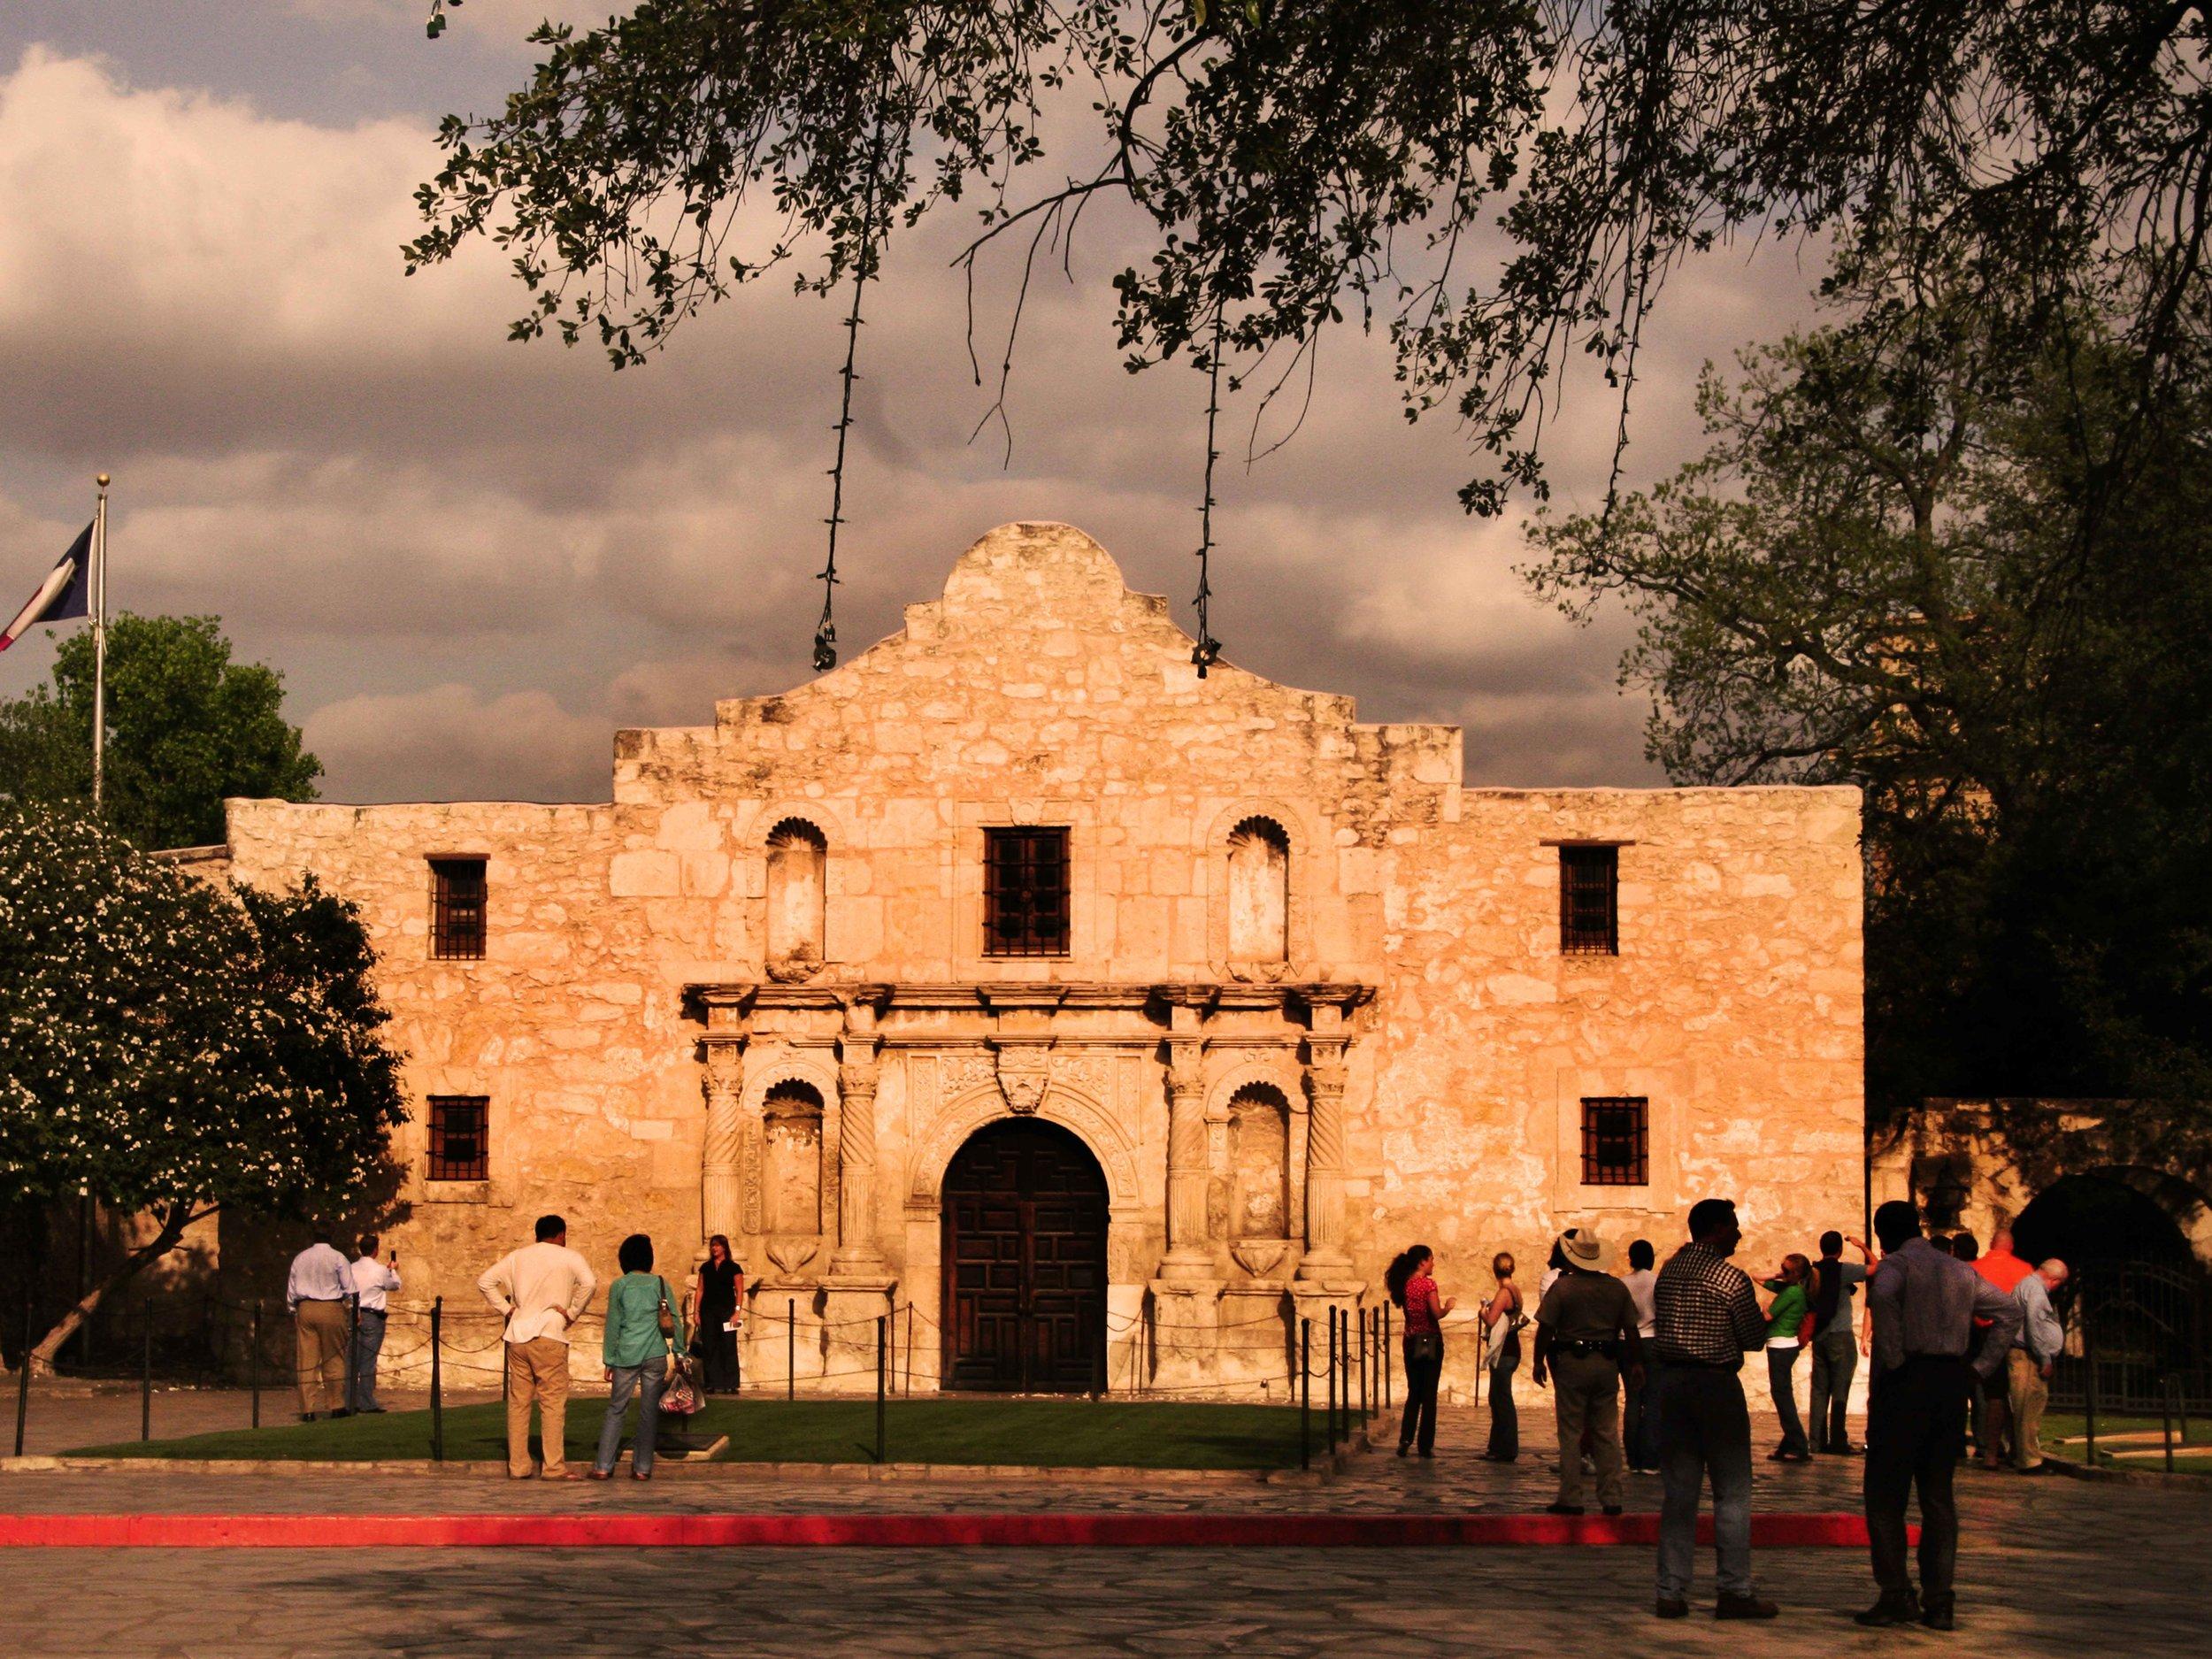 The Alamo at Sunset  © Joanne DiBona